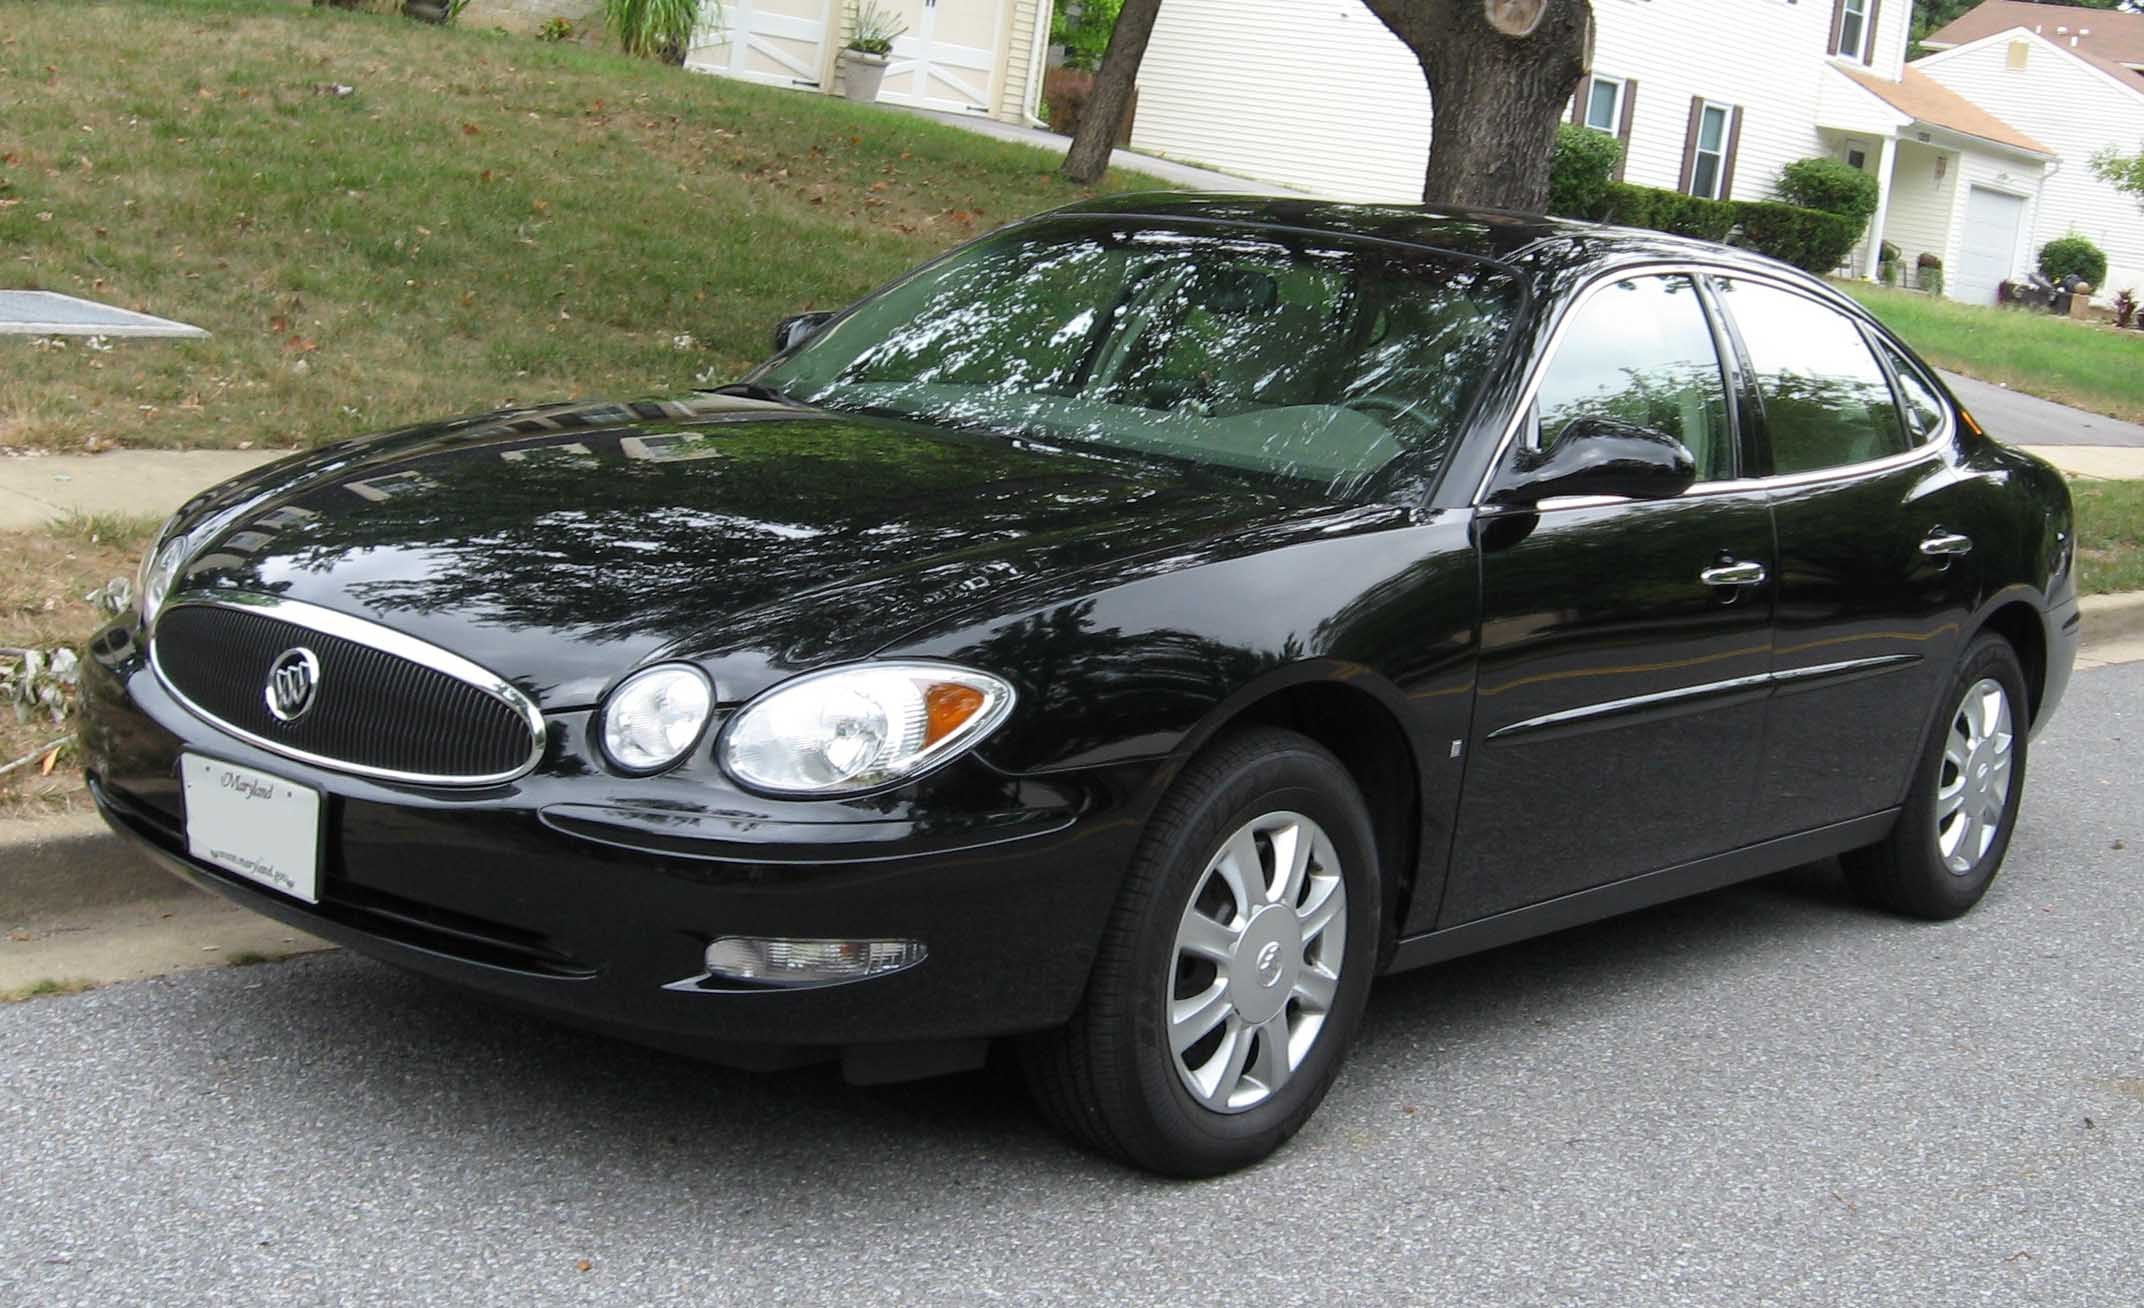 2007 Buick Lucerne Black >> File:Buick-LaCrosse-CX.jpg - Wikimedia Commons